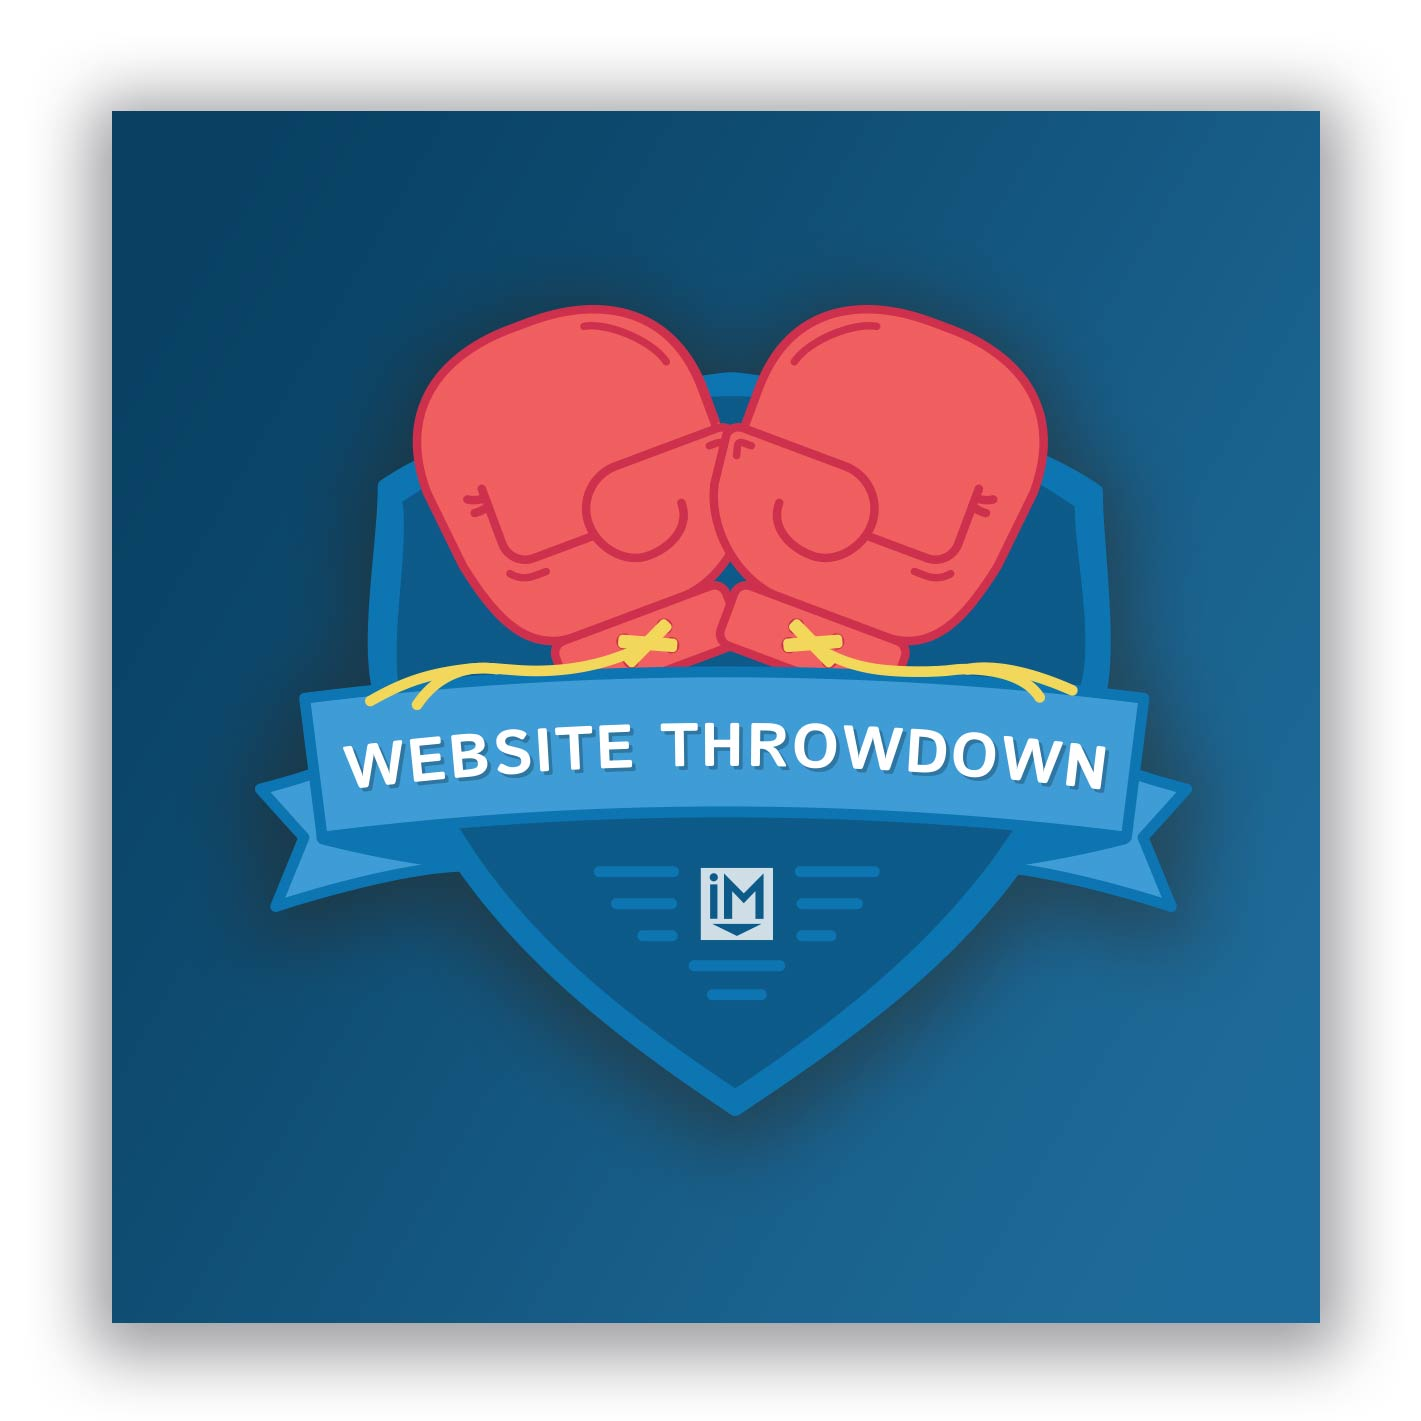 IMPACT Website Throwdown